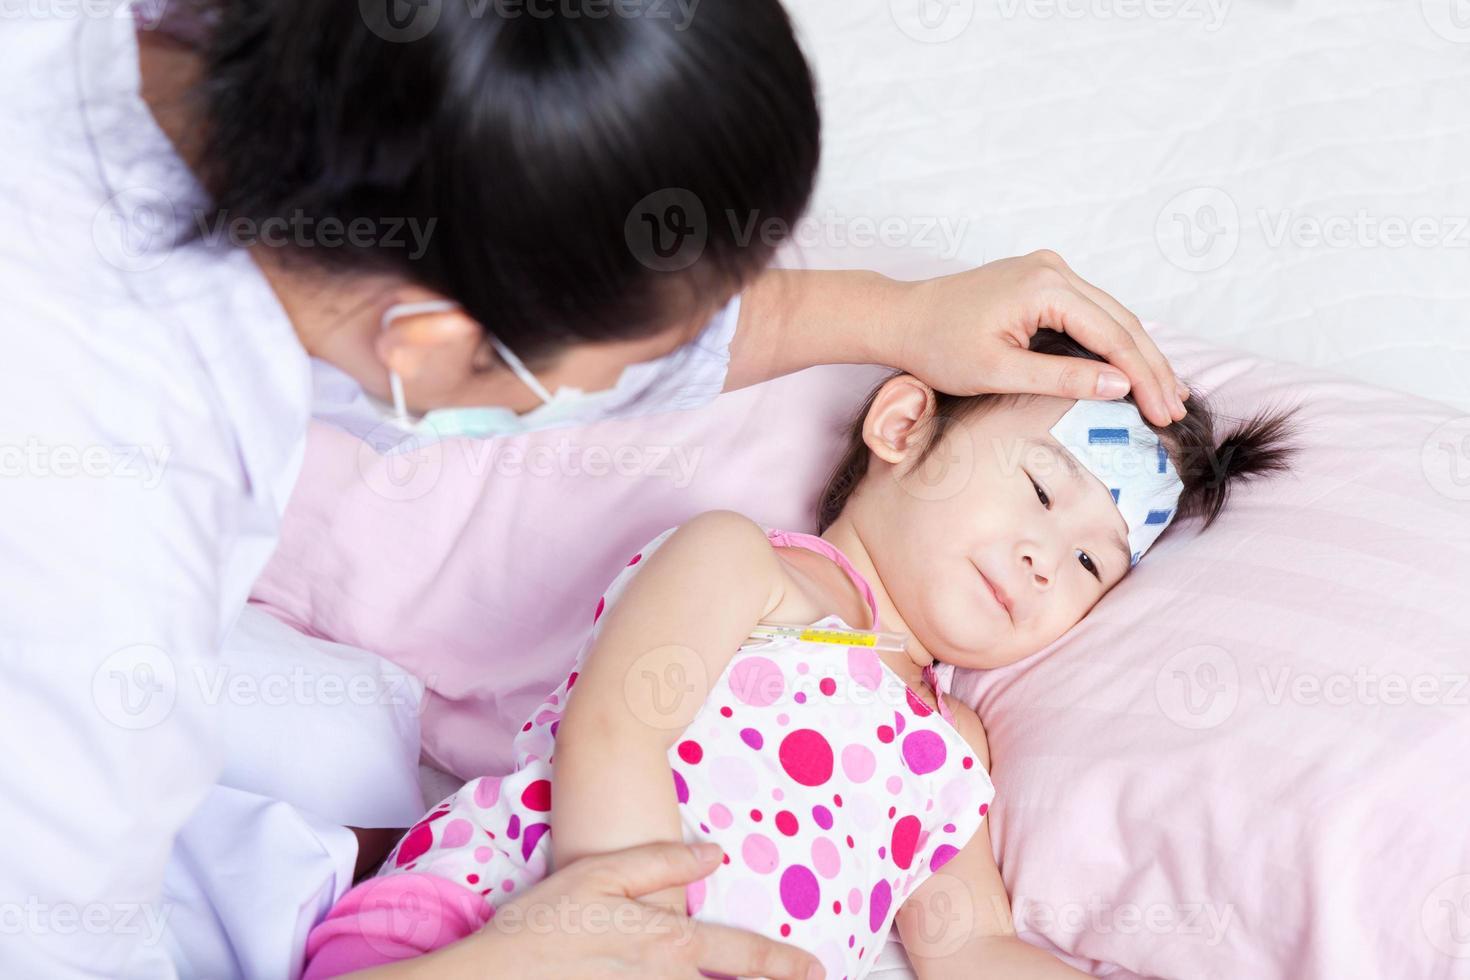 Sick little girl nursed by a pediatrician photo